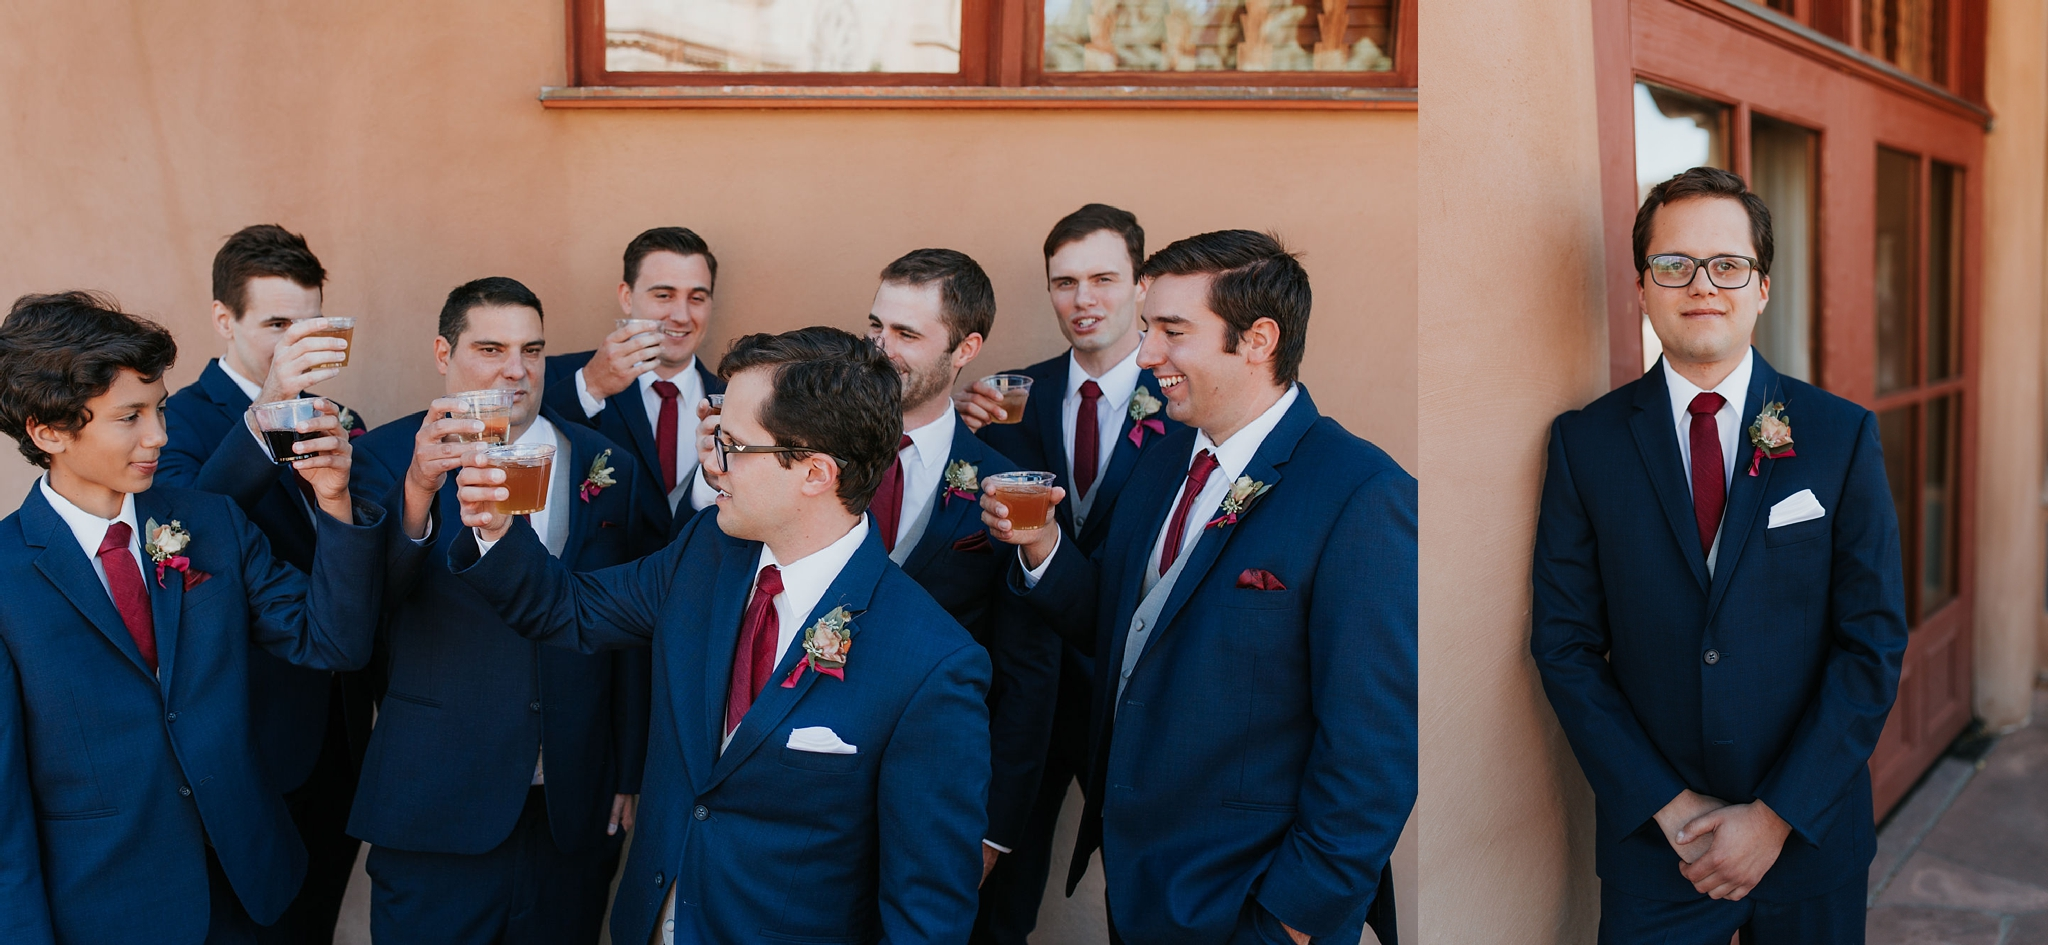 Alicia+lucia+photography+-+albuquerque+wedding+photographer+-+santa+fe+wedding+photography+-+new+mexico+wedding+photographer+-+new+mexico+wedding+-+wedding+-+groom+-+groom+style+-+wedding+style_0073.jpg